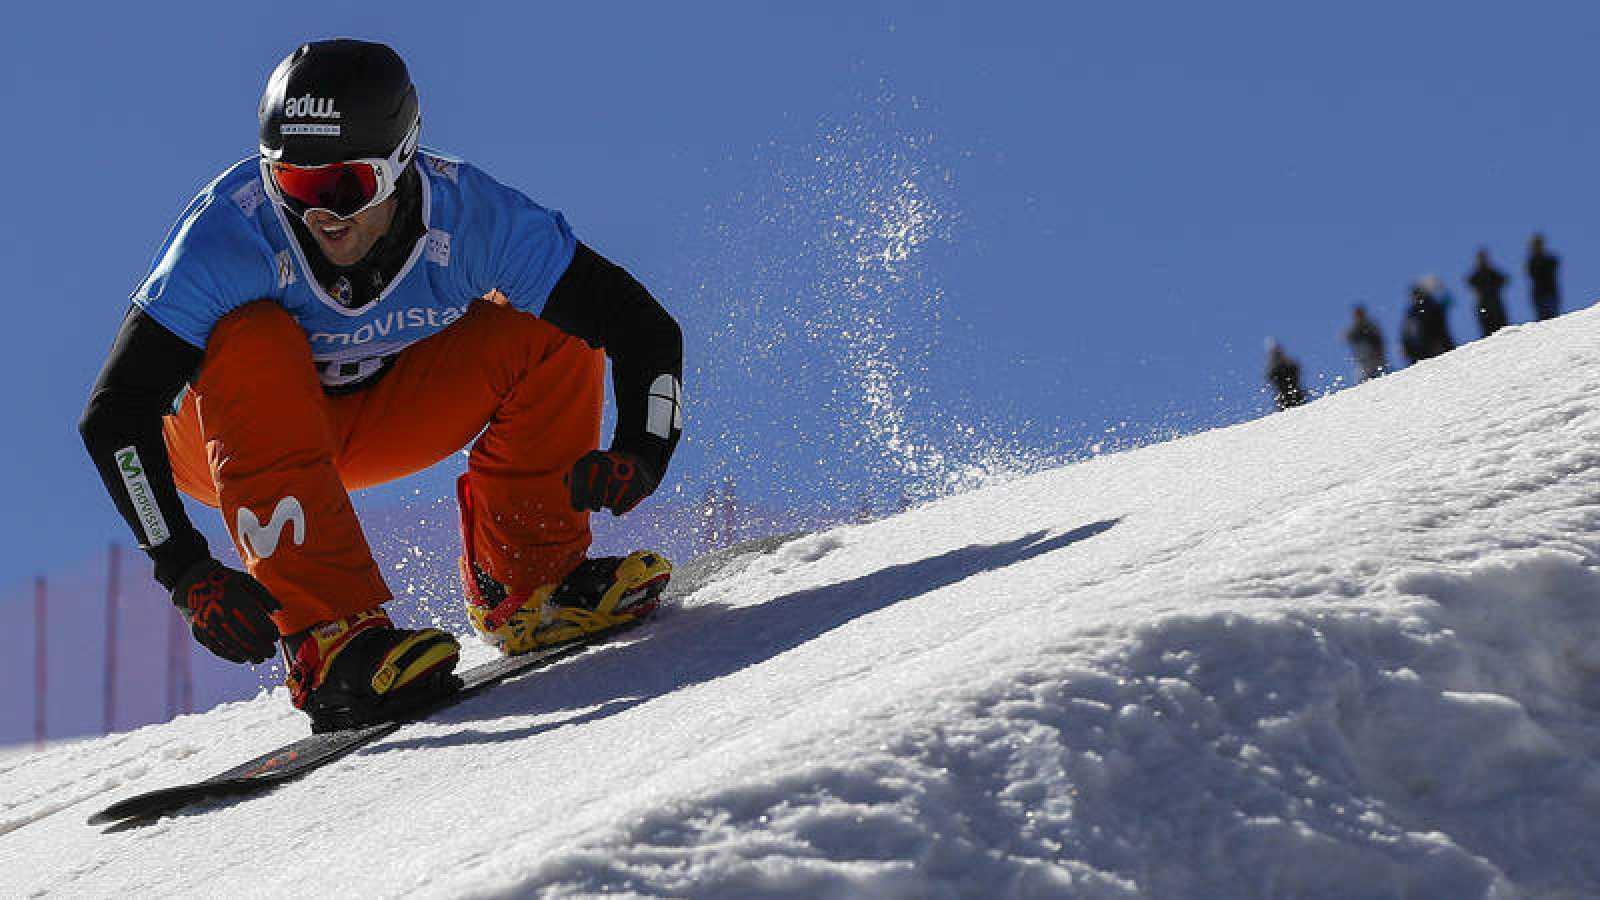 Lucas Eguibar, candidato a subir al podio en los Juegos de Pyeongchang.